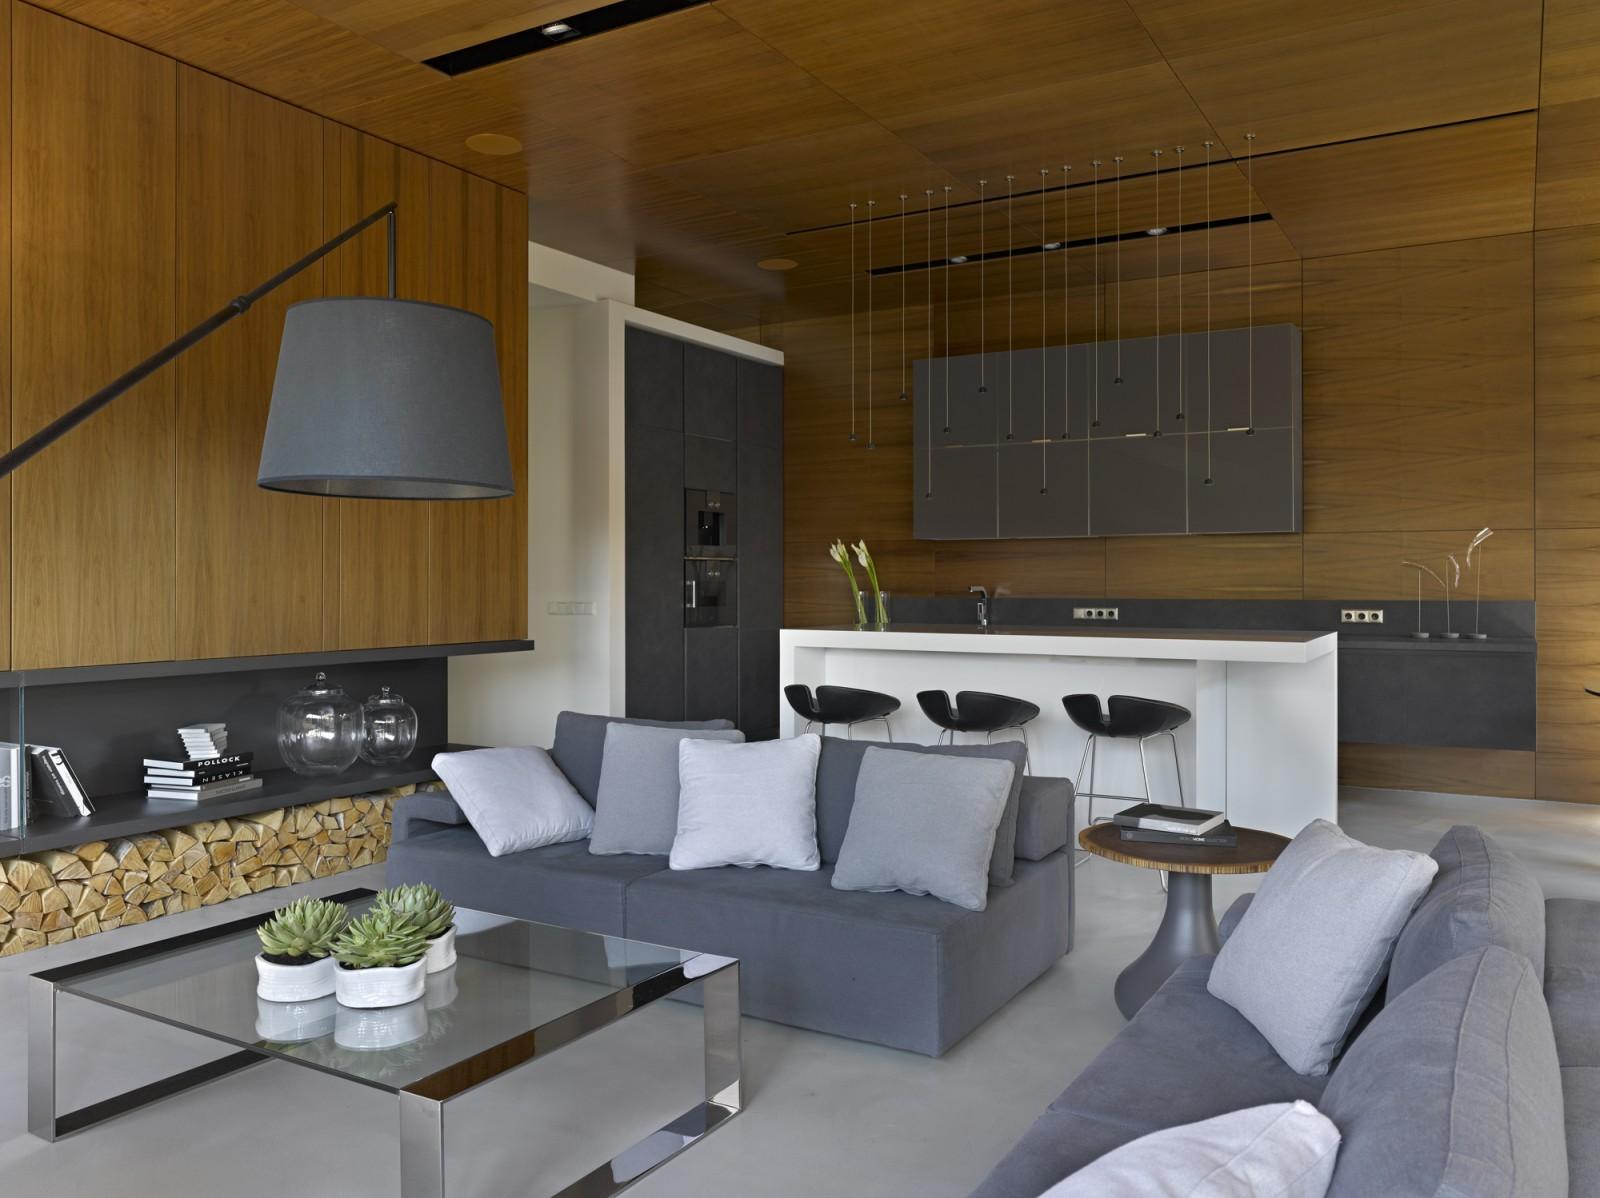 Nice villa interior by architectural Bureau of Alexandra Fedorova - 02